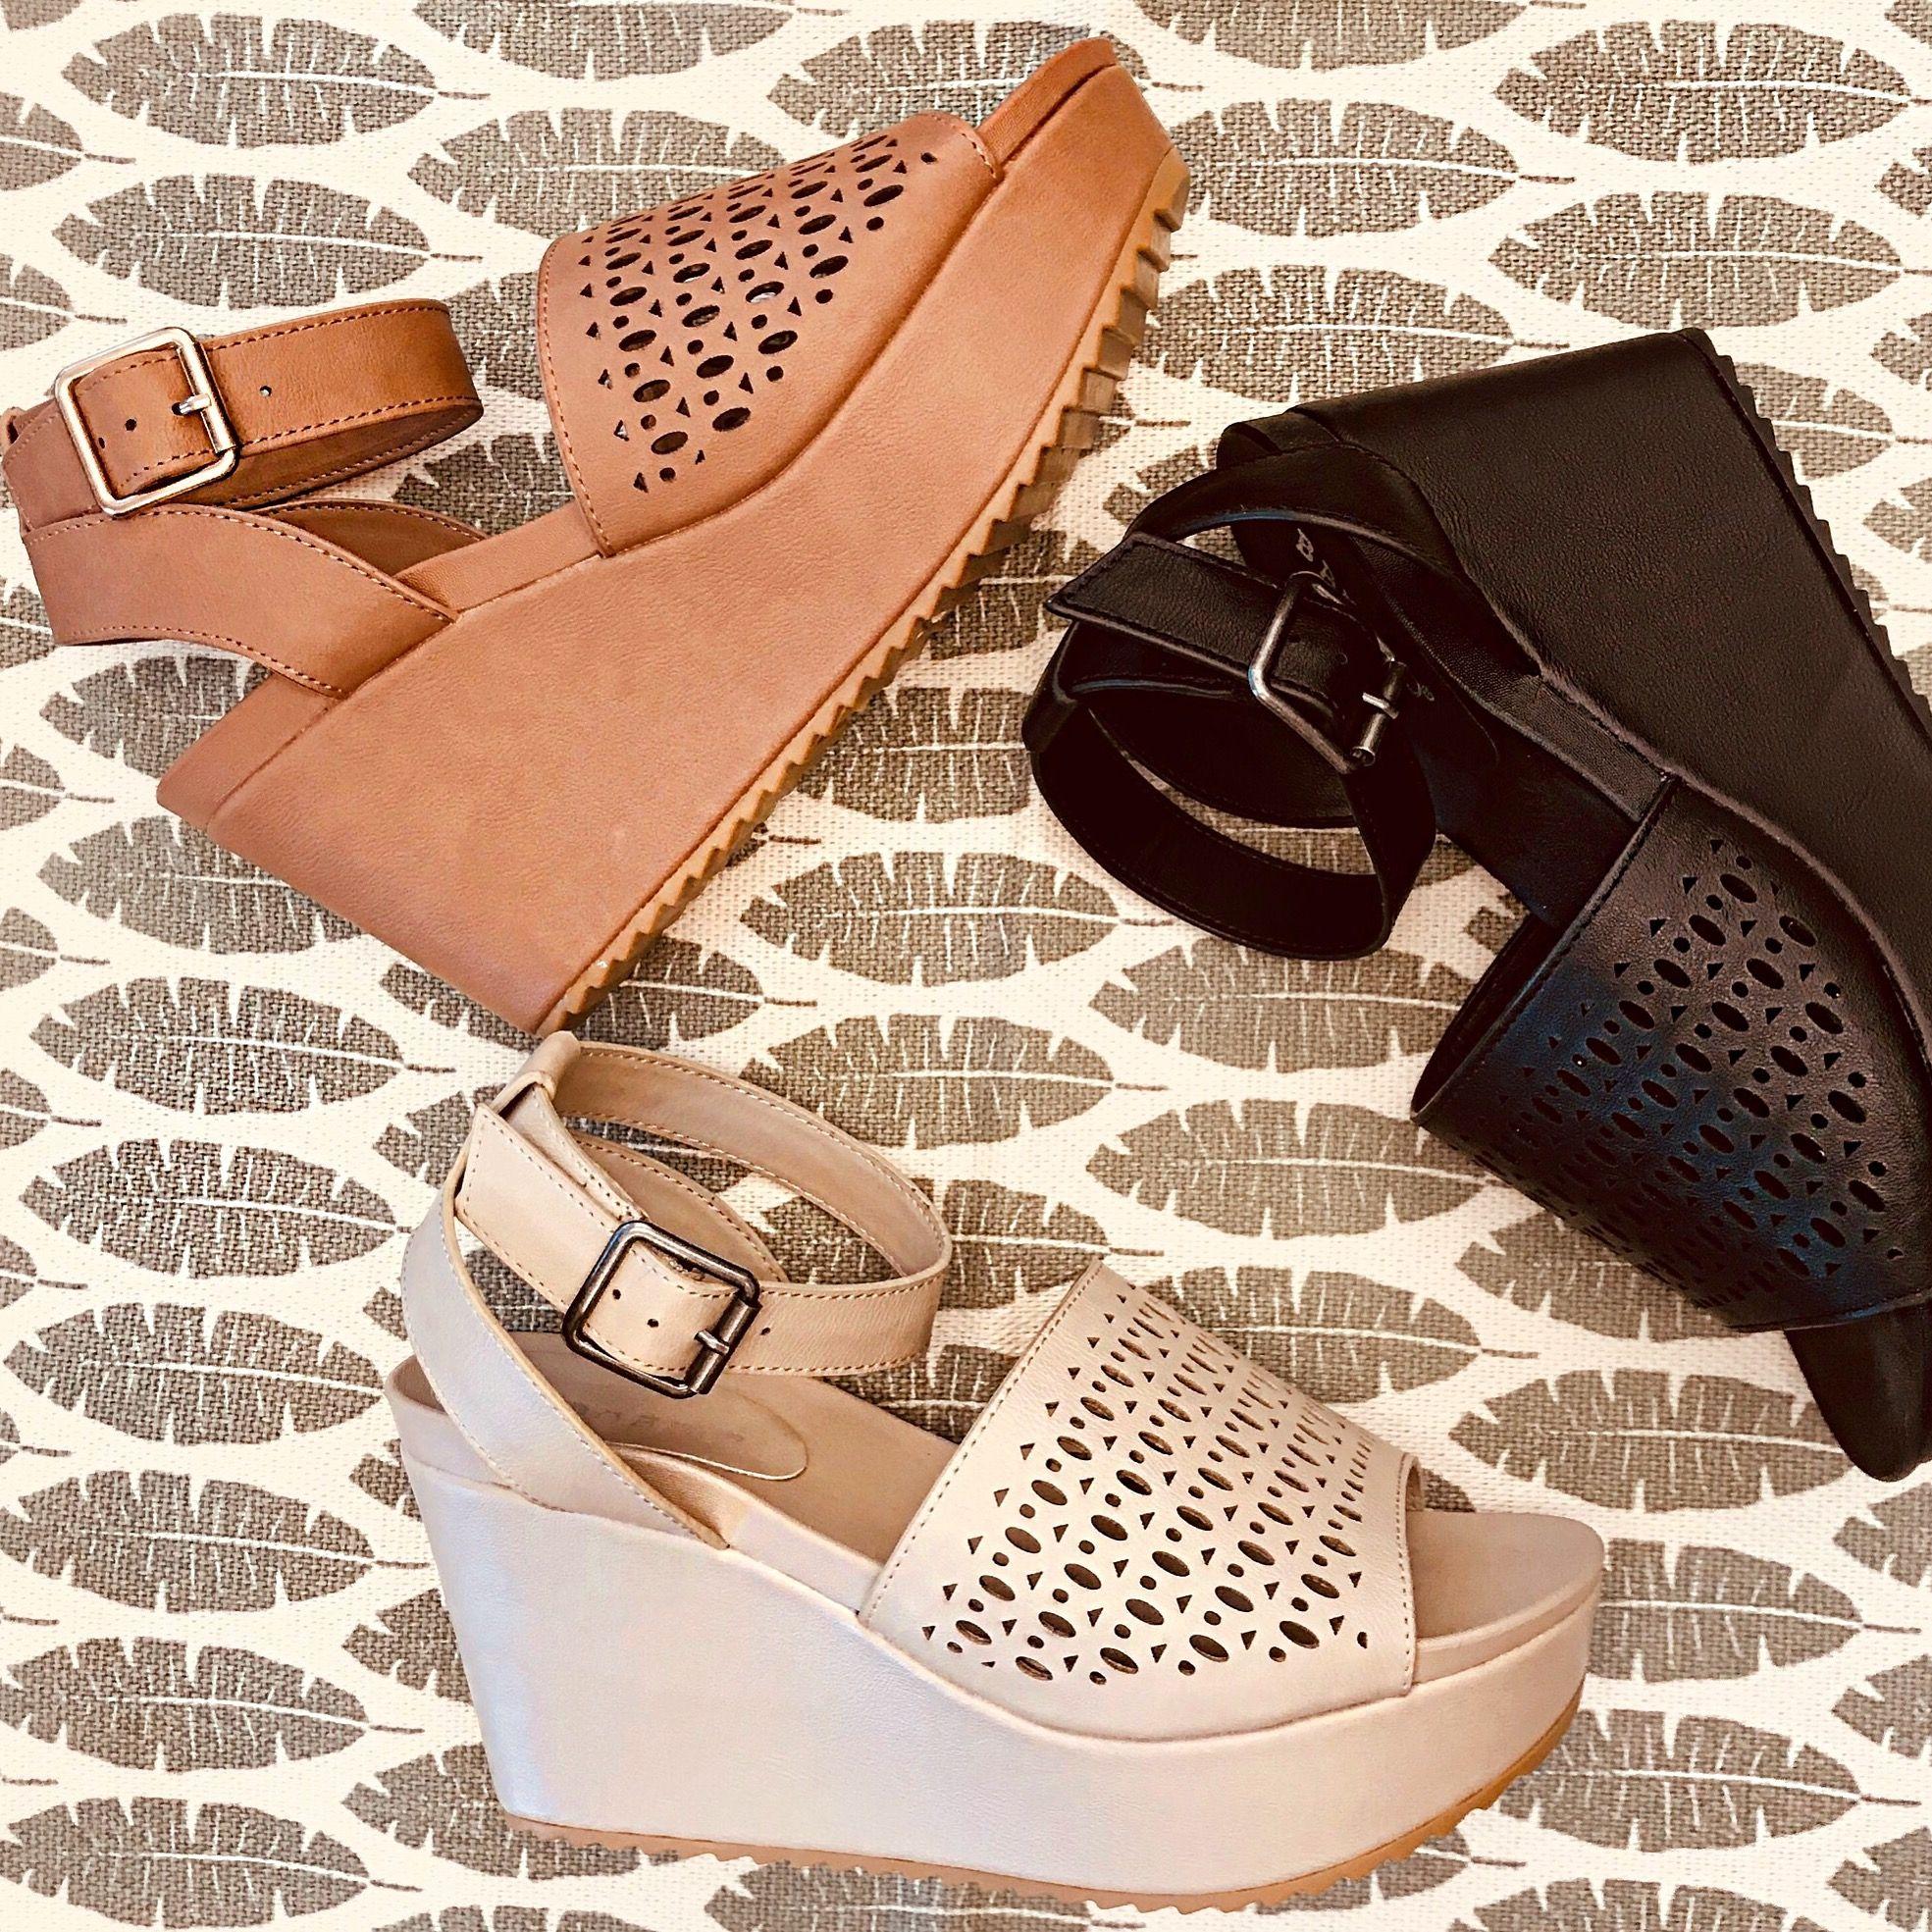 Bamboo shoes, Vegan shoes, Wholesale shoes